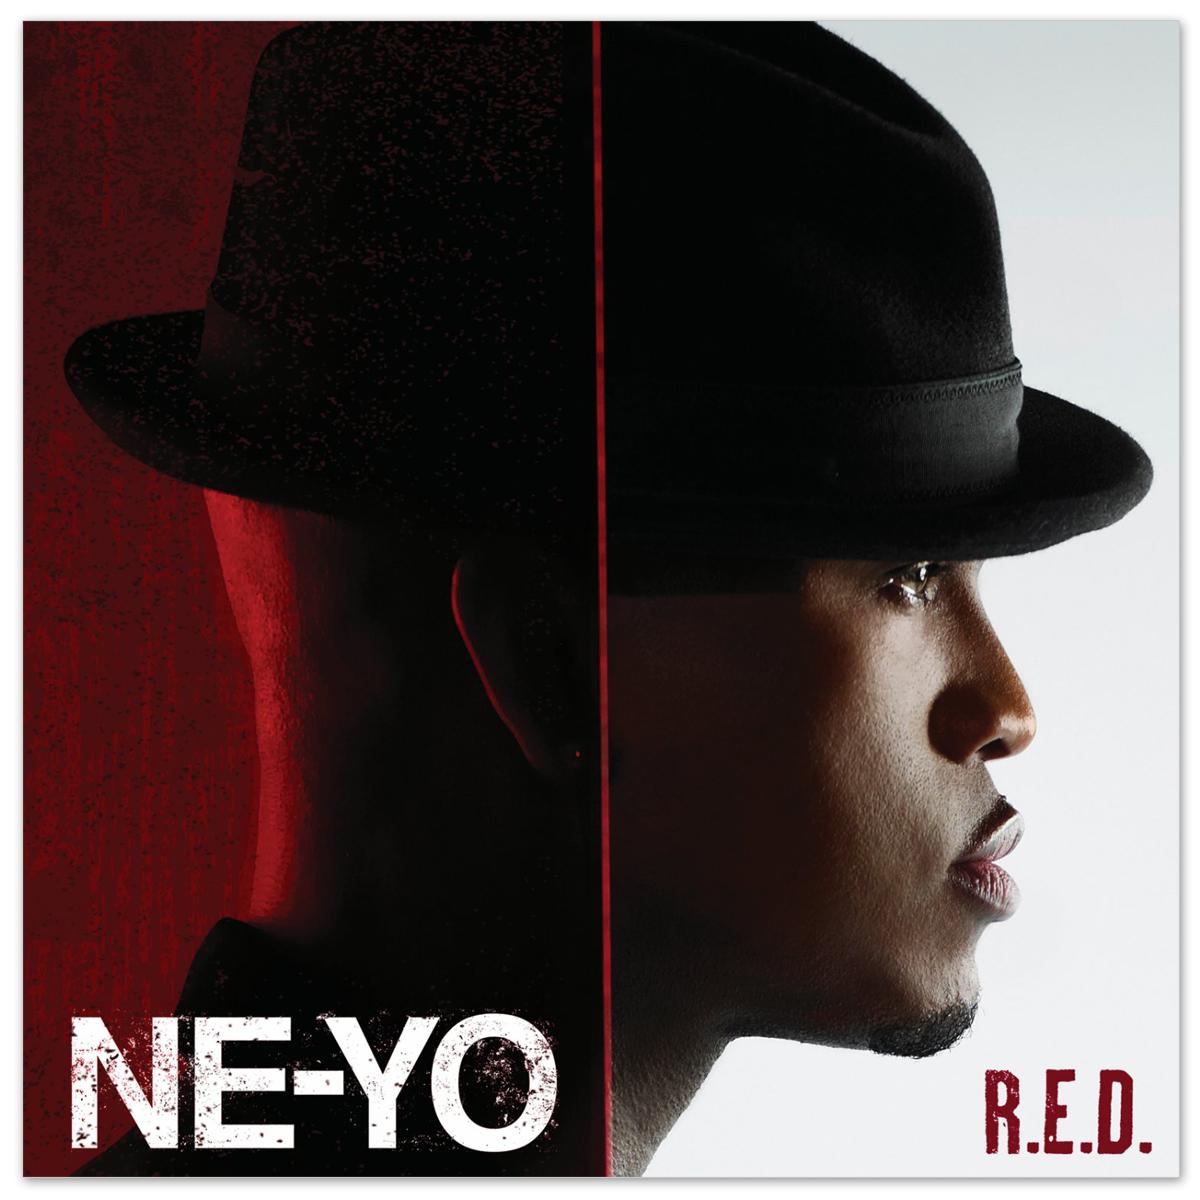 Ne-Yo - R.E.D. Deluxe CD